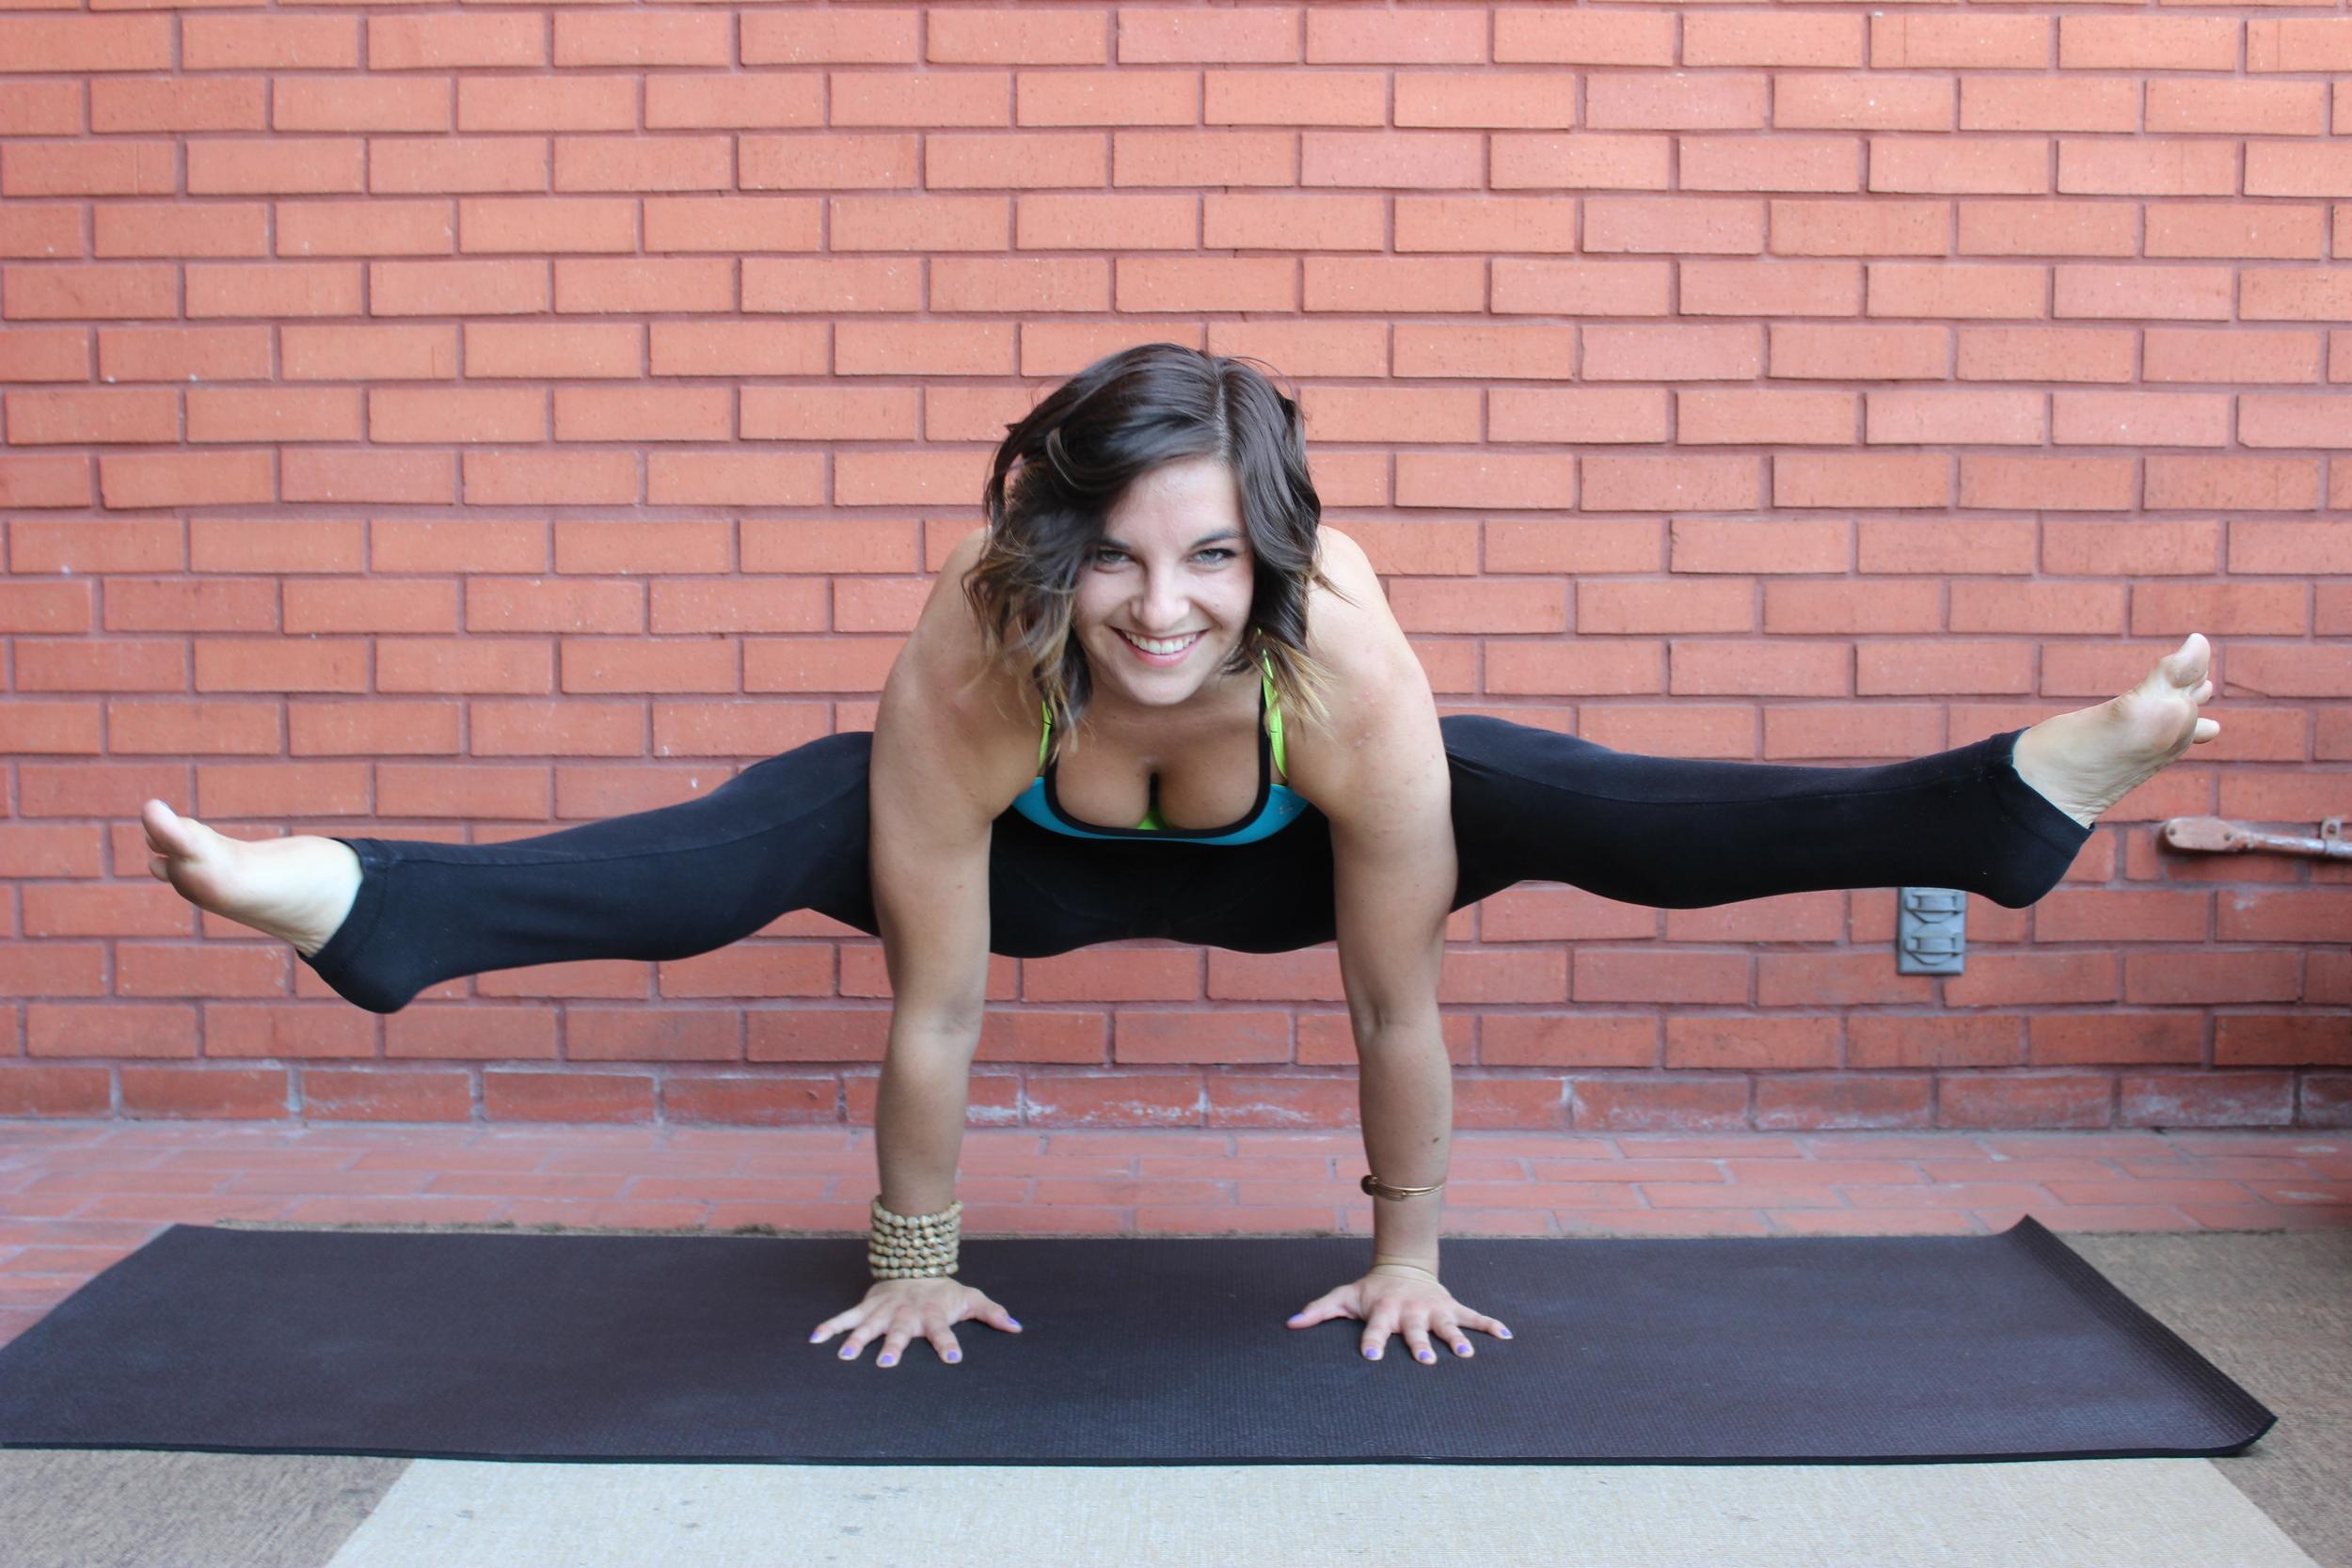 Corepower Yoga Photoshoot!